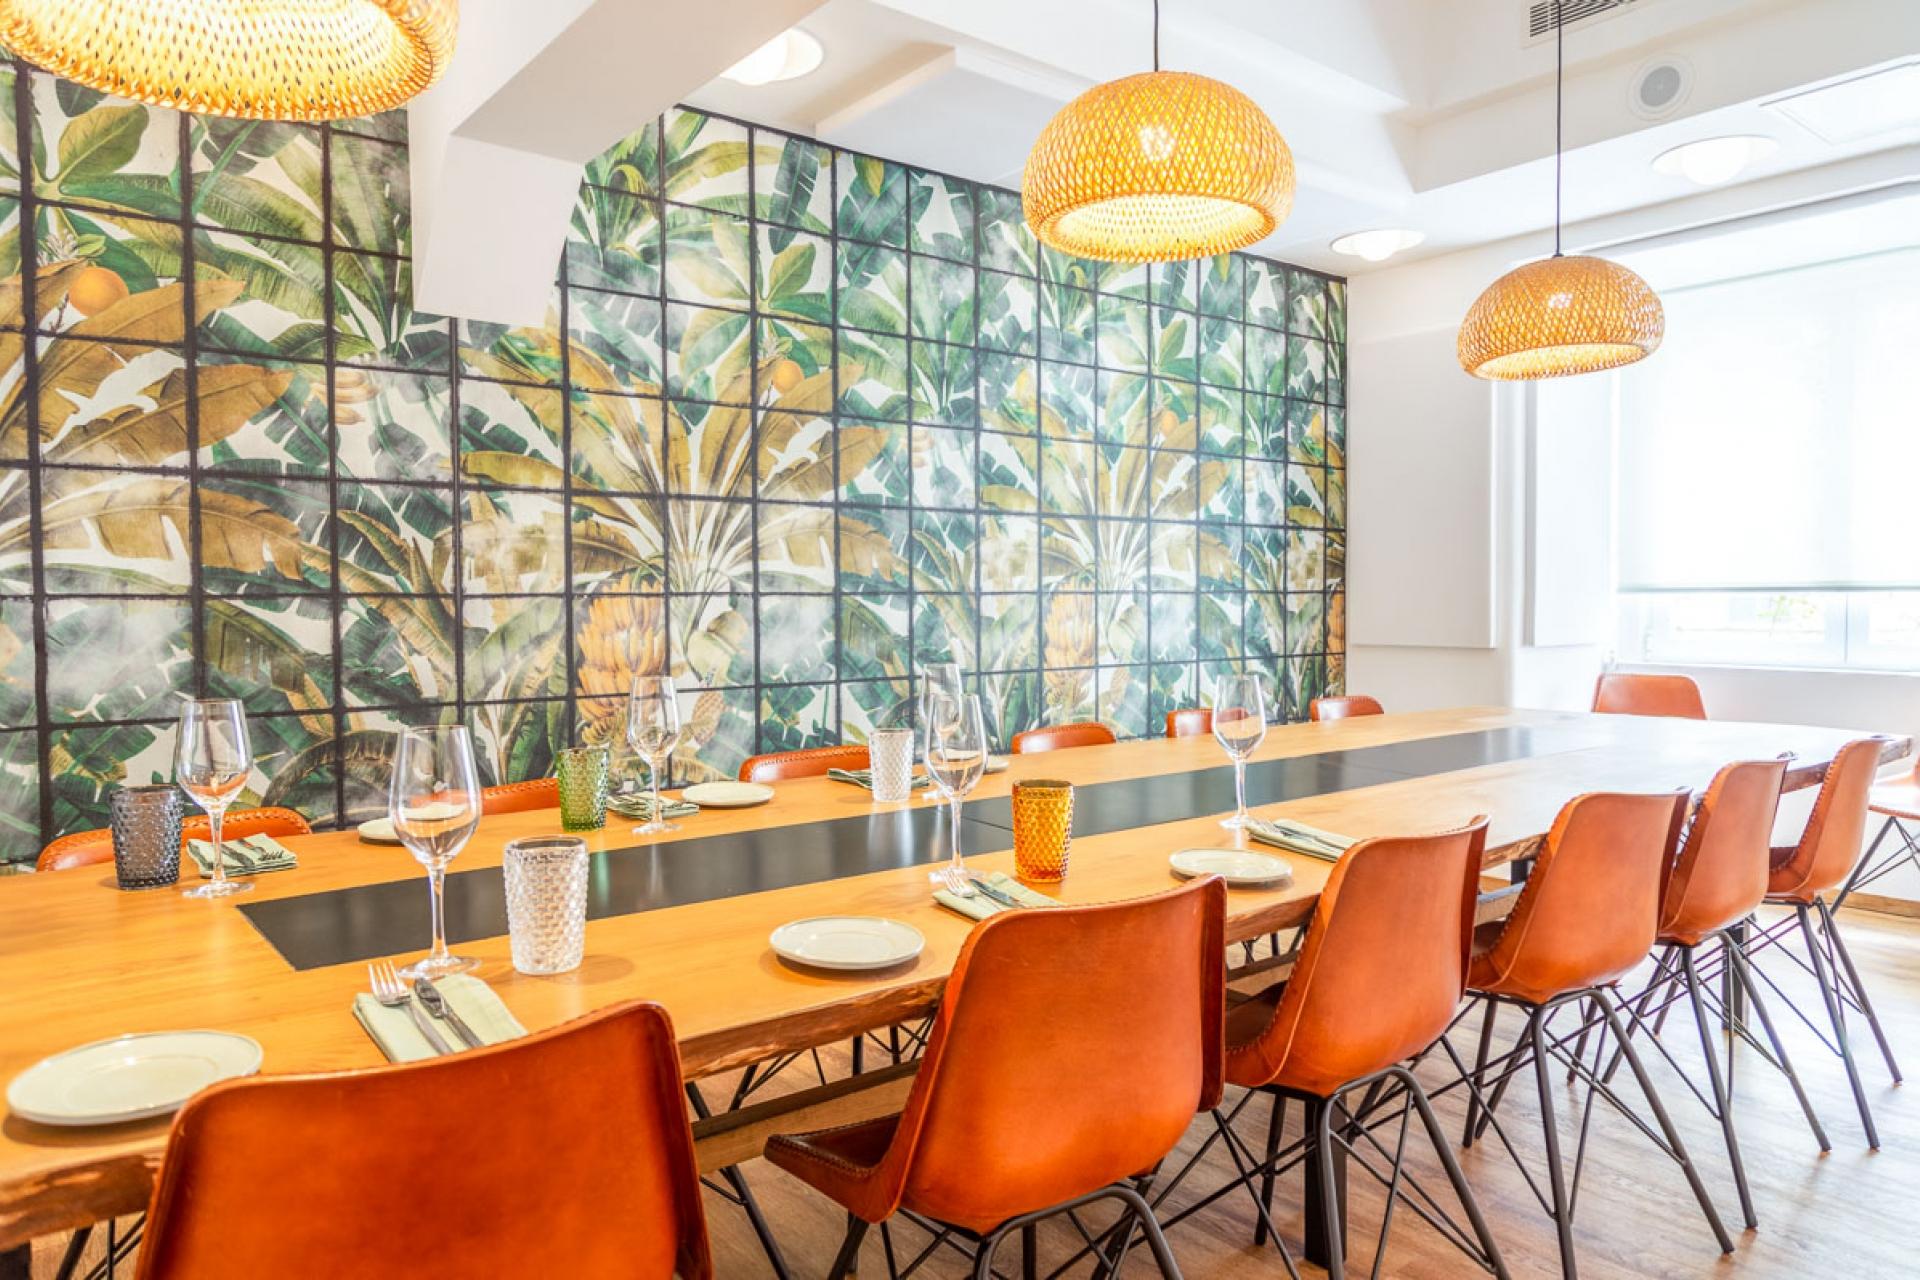 LisboaCool_Comer_Restaurante_Saraiva's